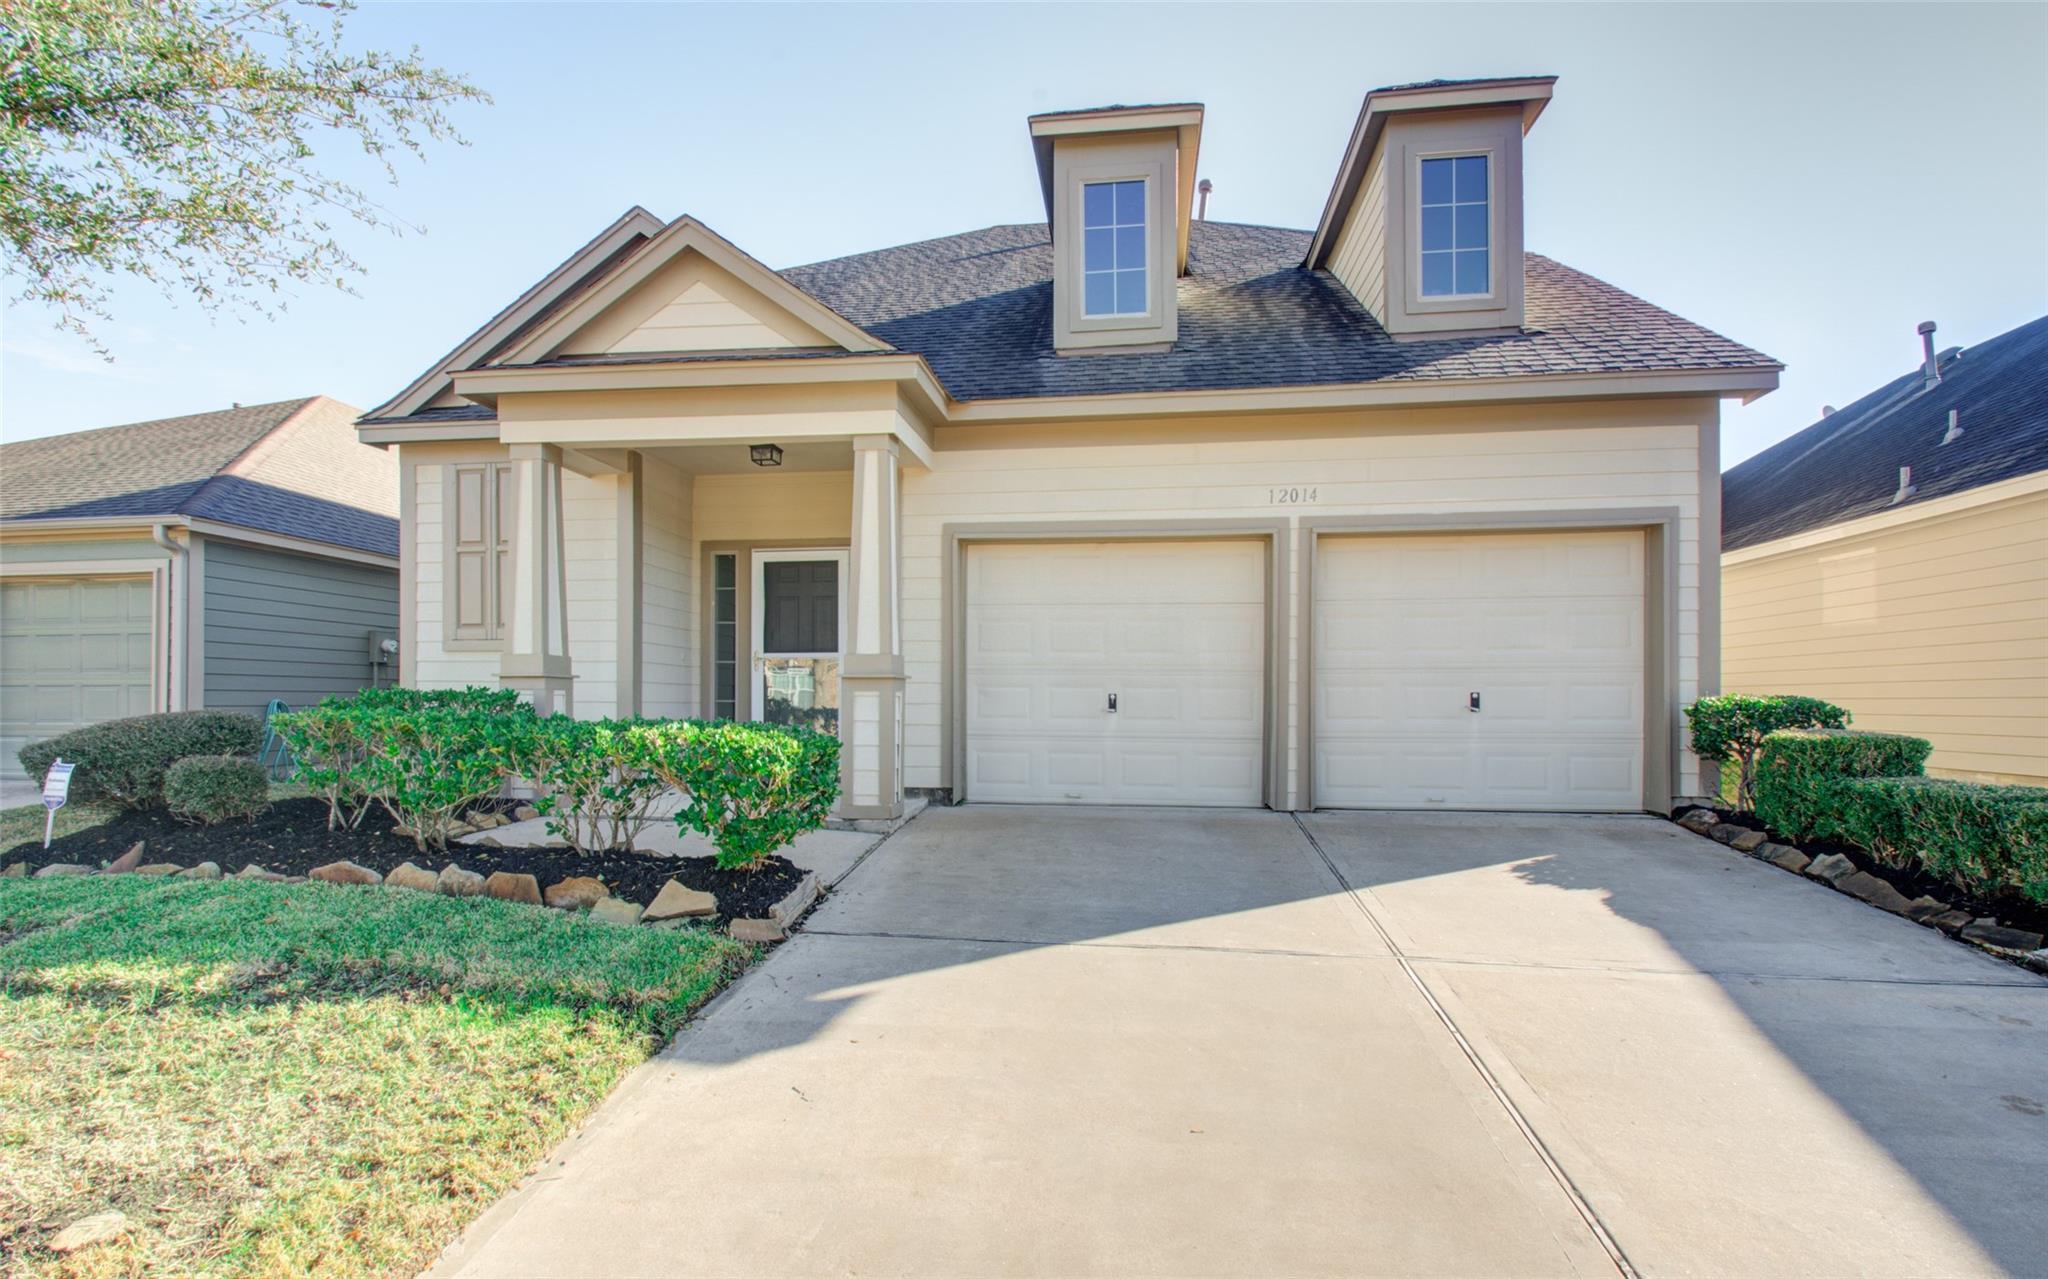 12014 Grace Hall Drive Property Photo - Houston, TX real estate listing